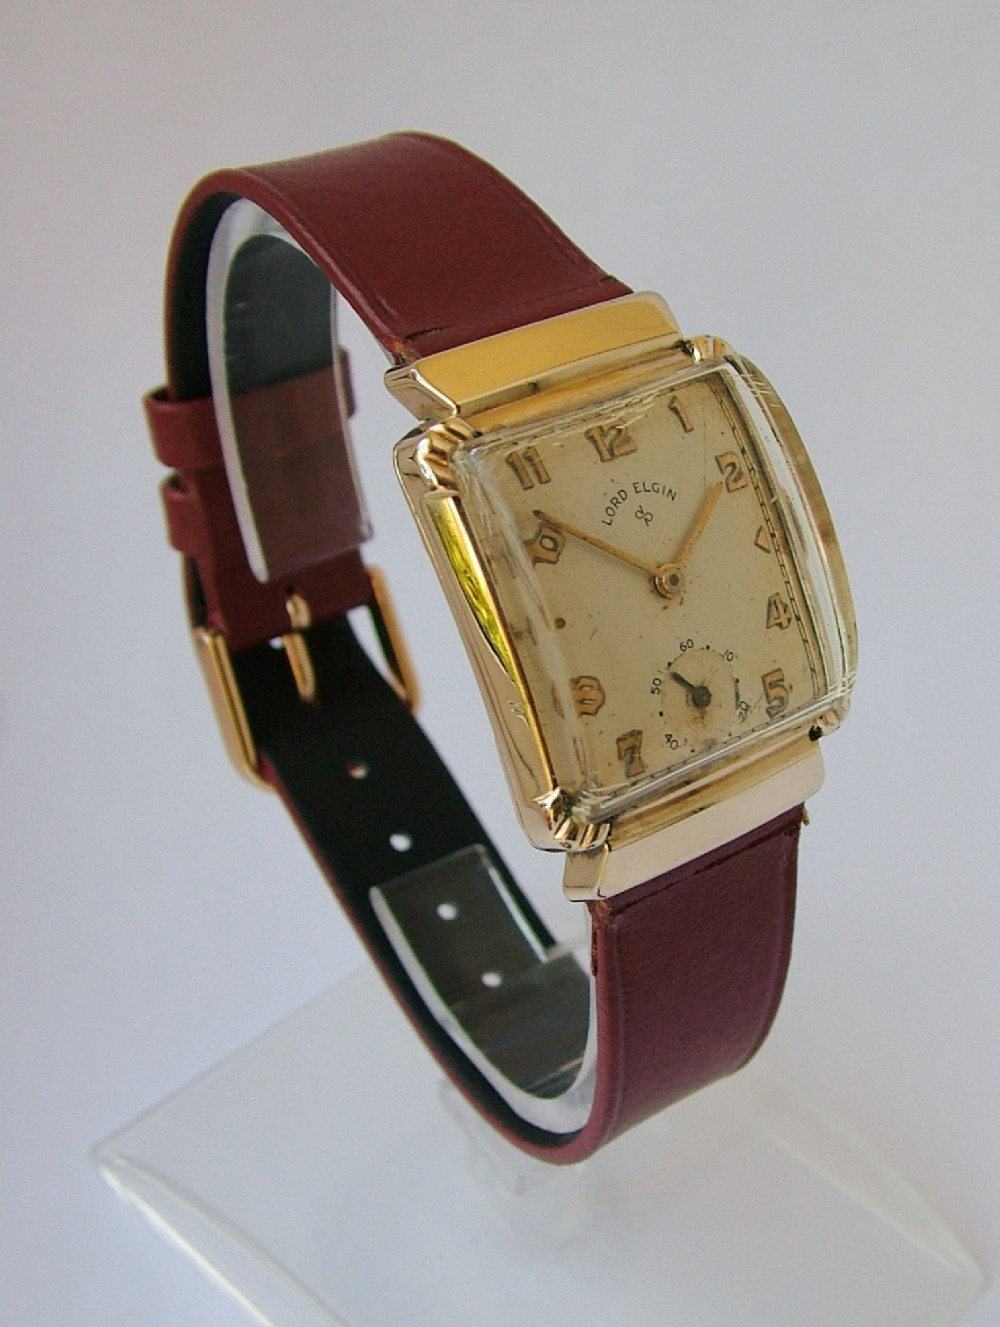 Vintage Gents1949 Lord Elgin 14k Gold Filled Wrist Watch | 319564 |  Sellingantiques.co.uk